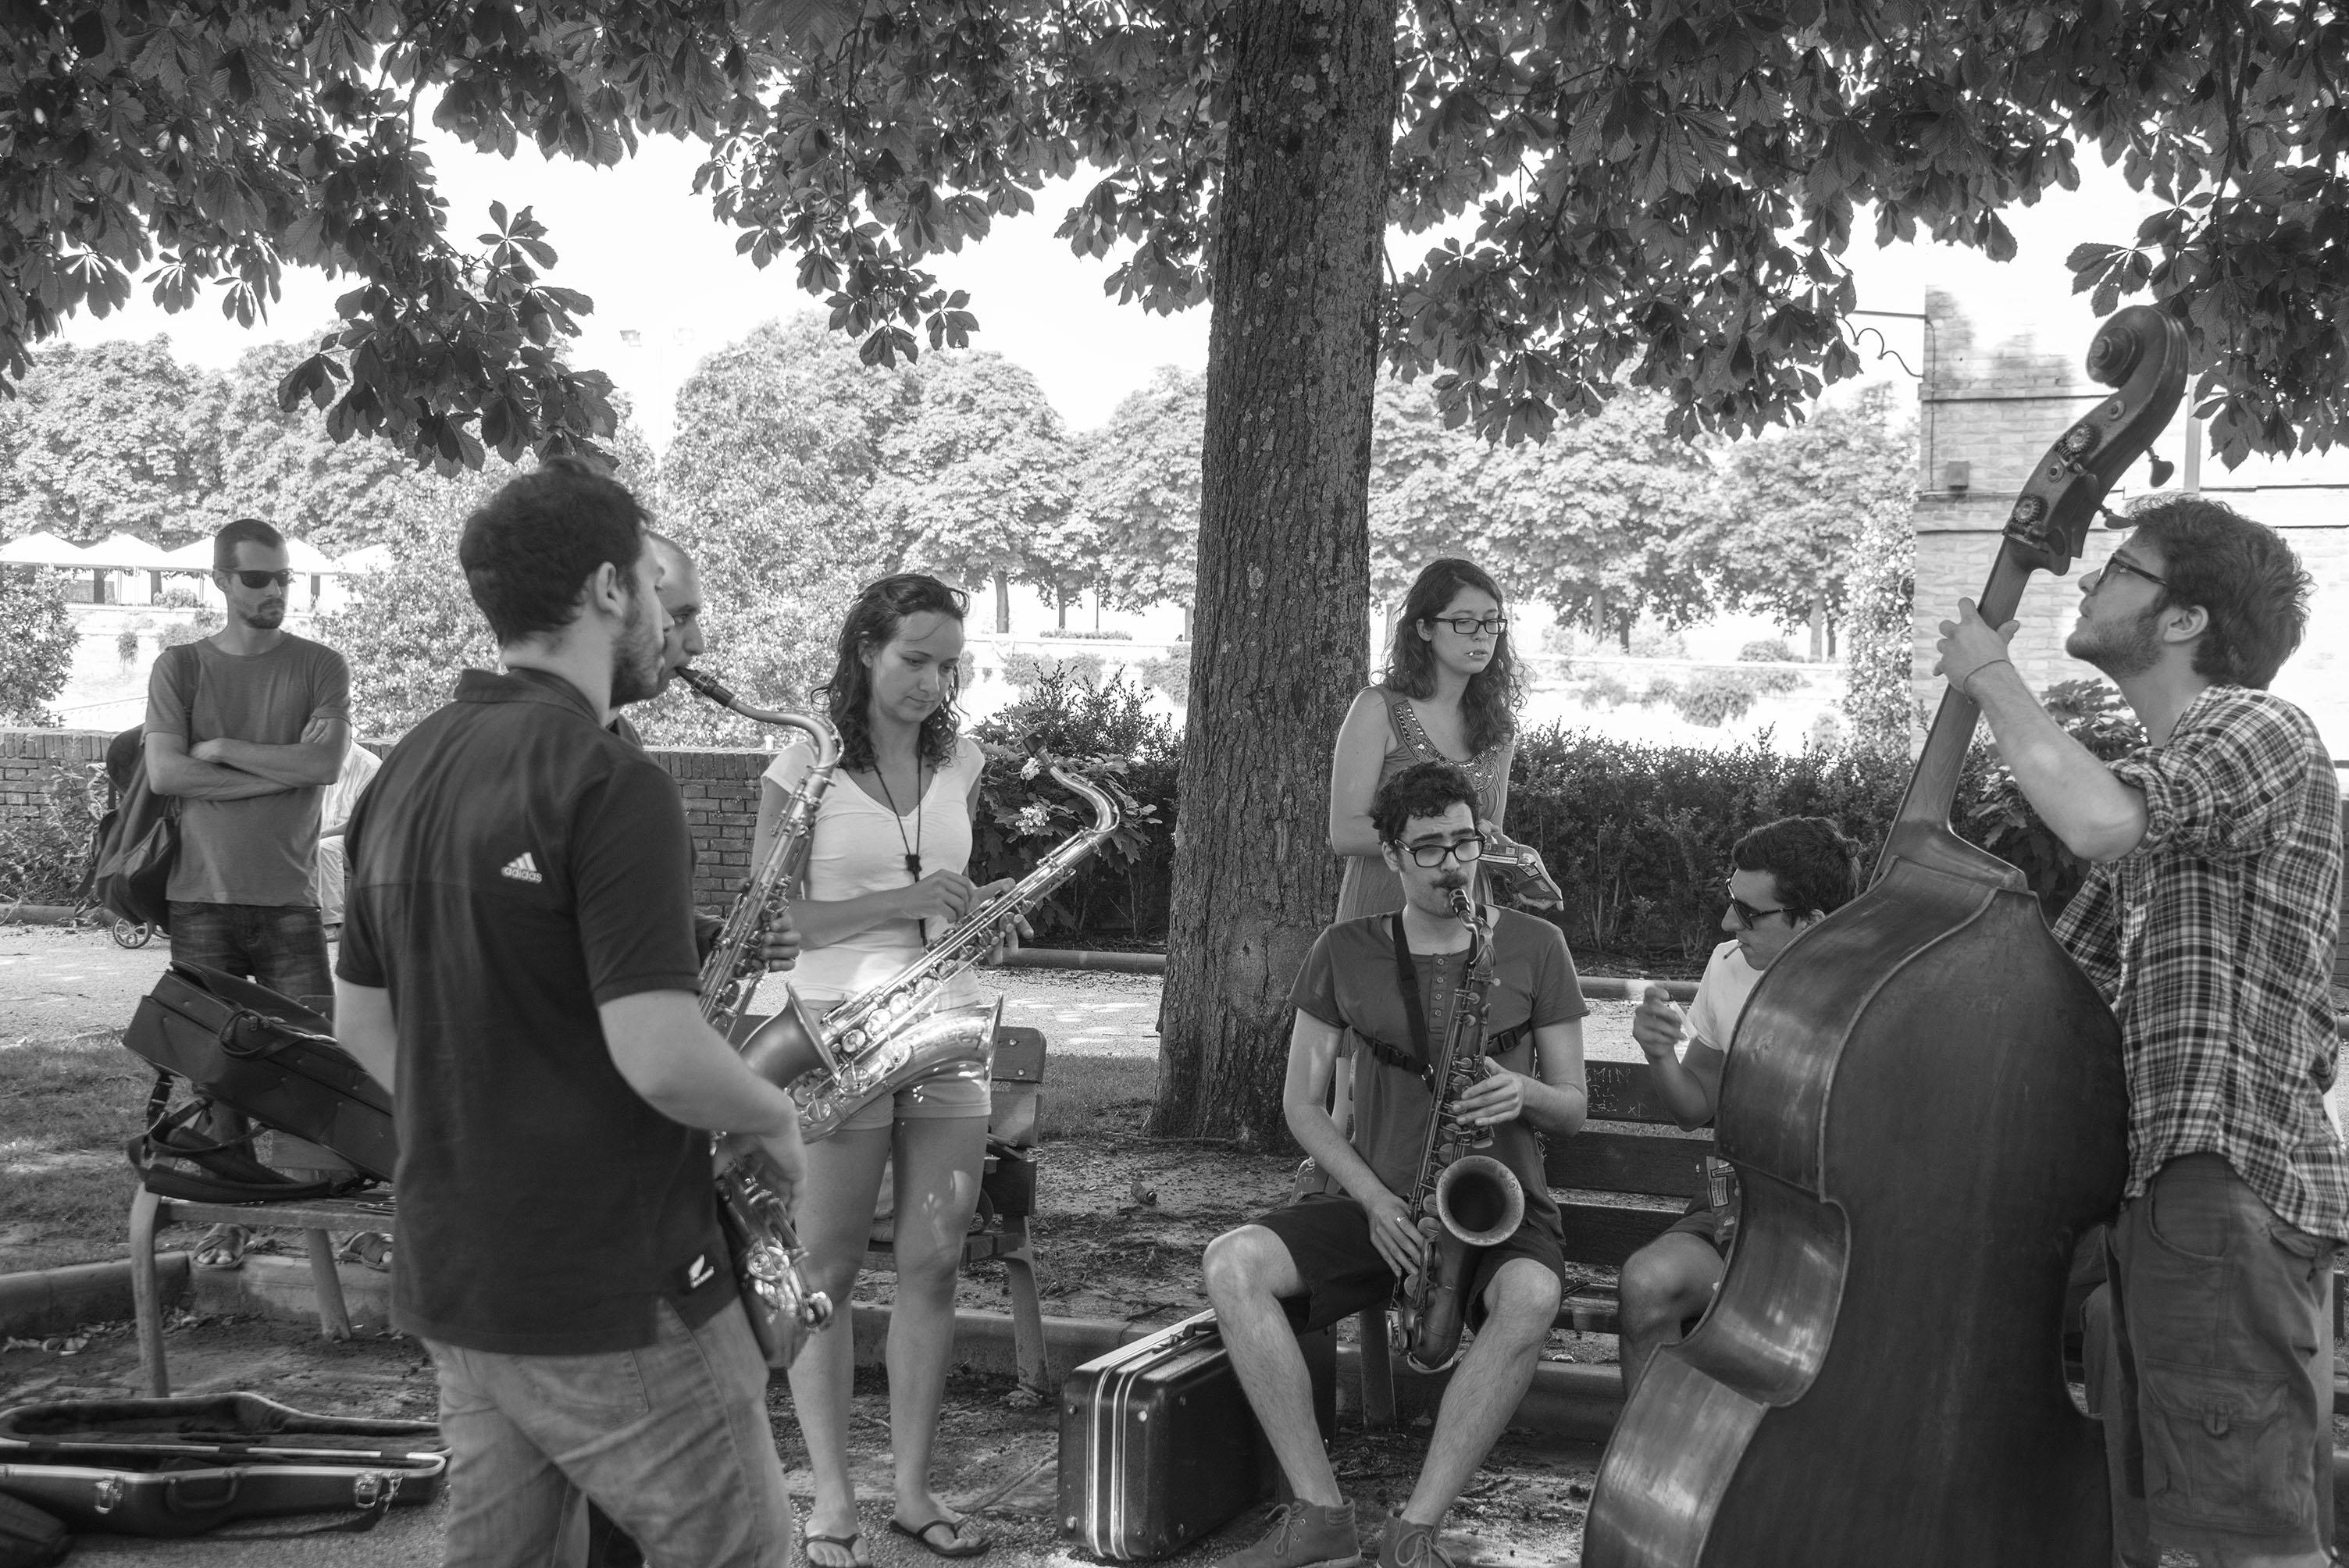 Students rehearsing, 2013 siena jazz academy summer workshop